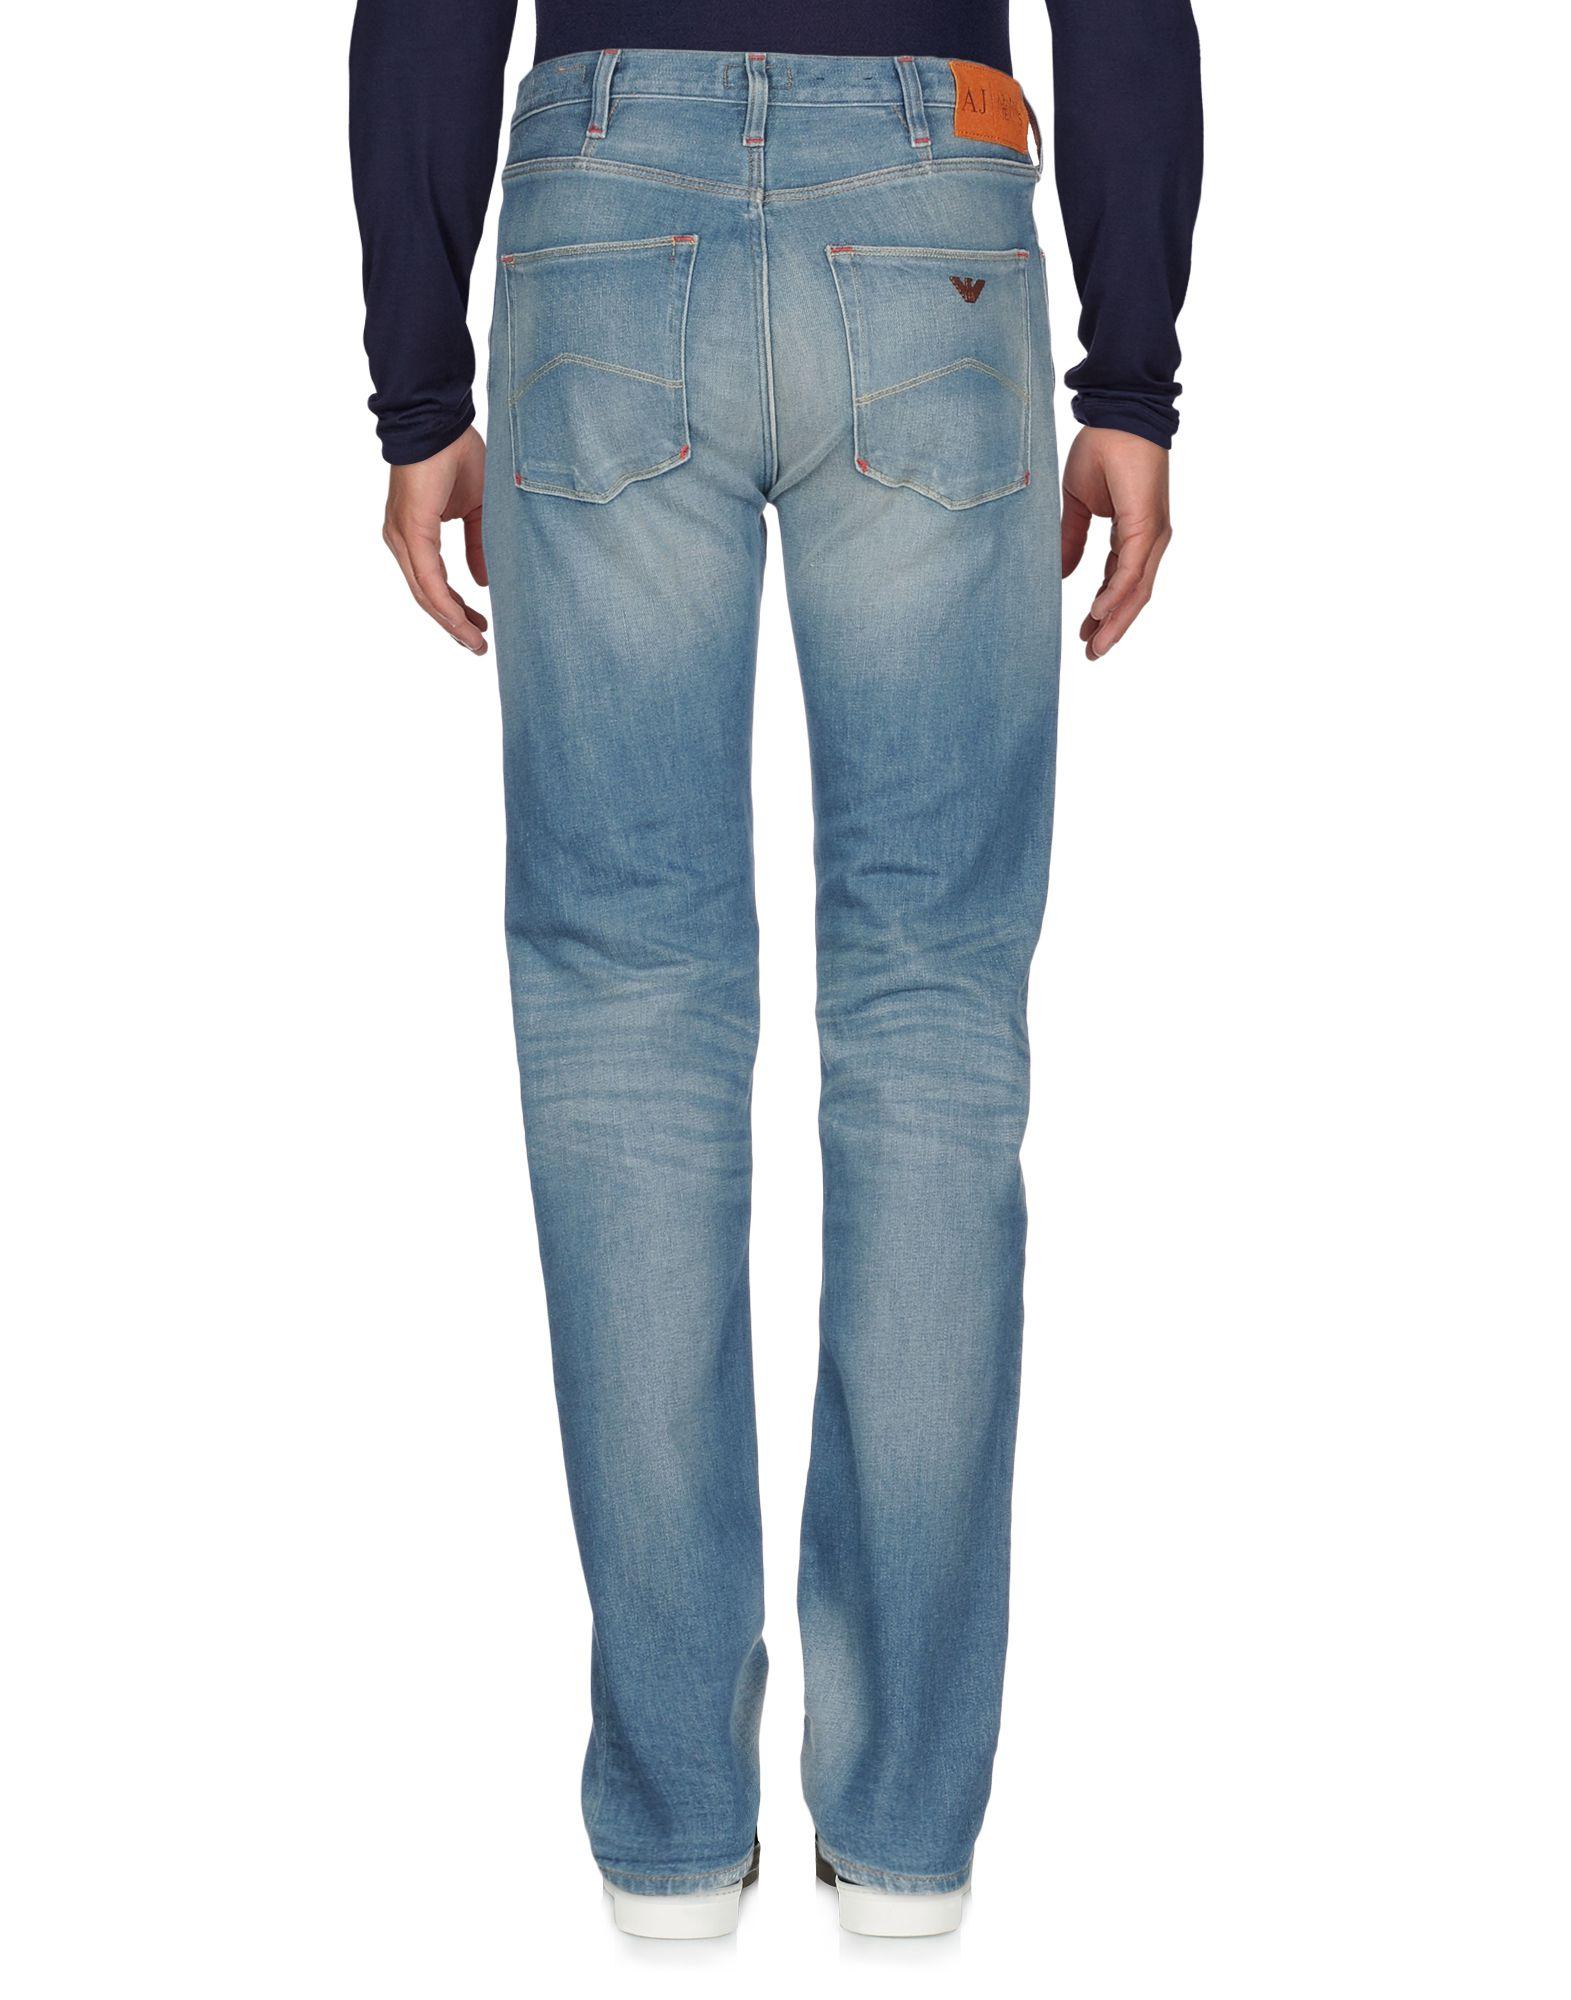 Pantaloni Jeans Armani Jeans Uomo 42683580JE - 42683580JE Uomo b3cfe6